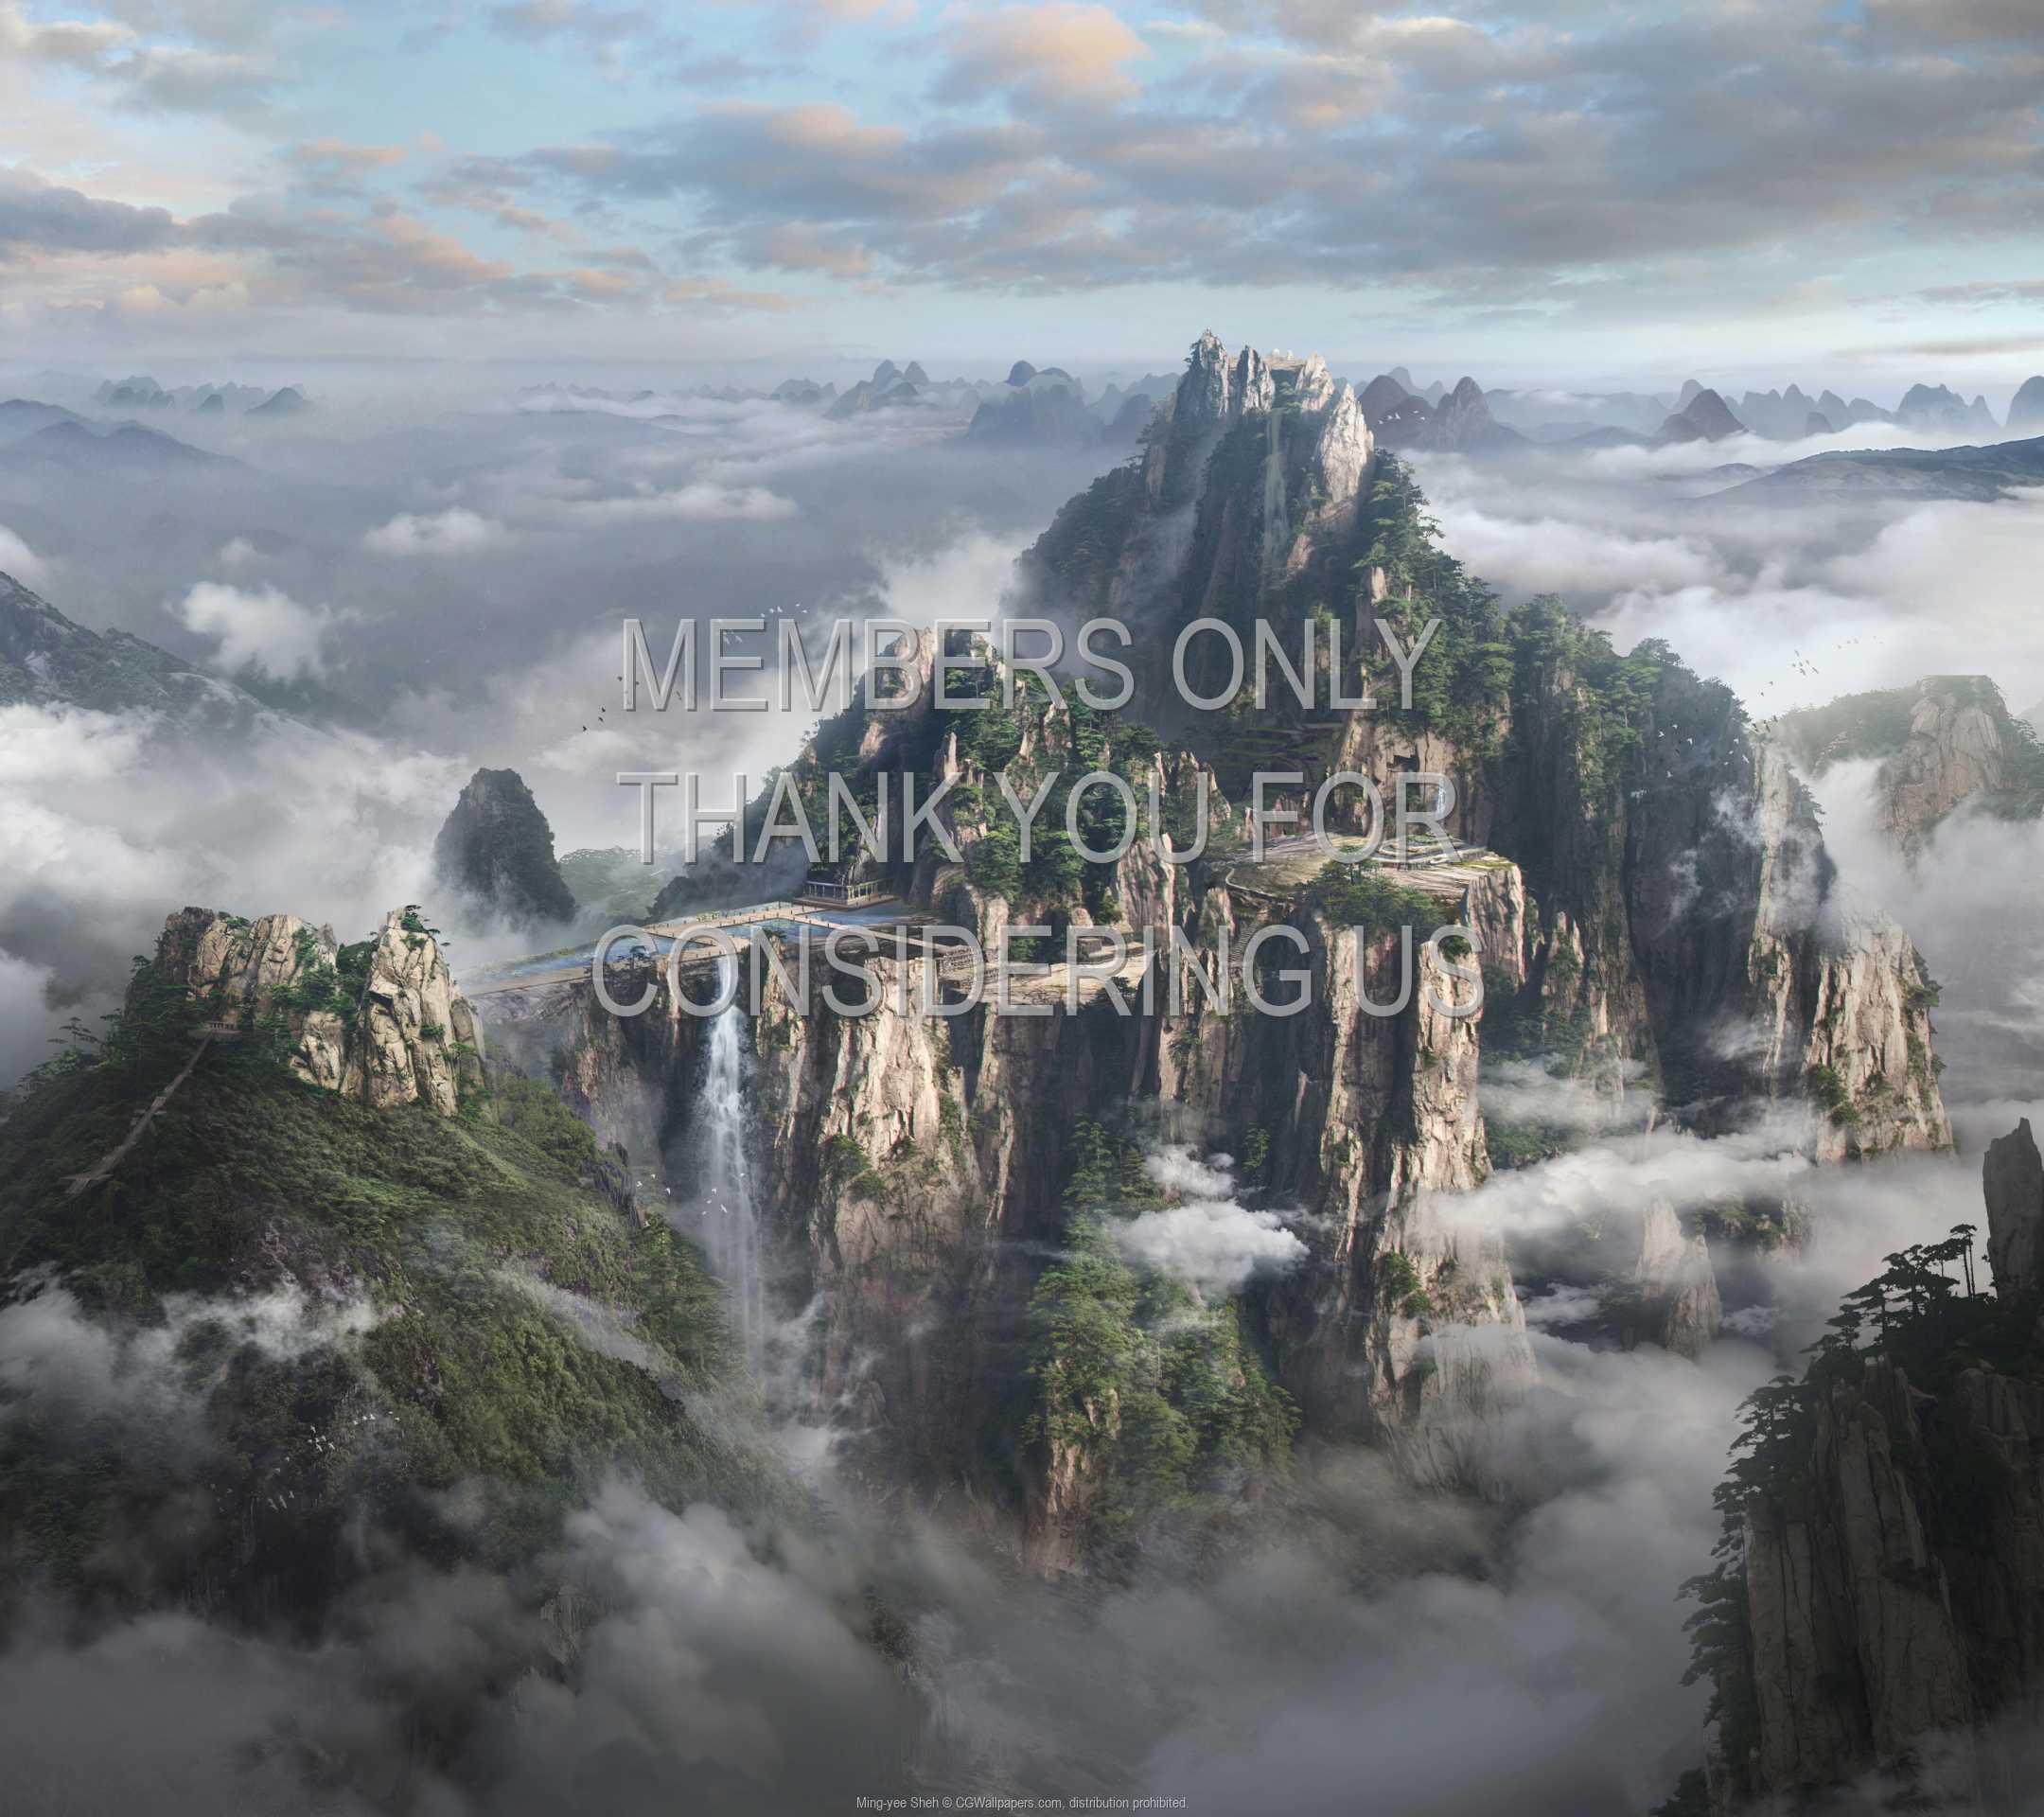 Ming-yee Sheh 1080p Horizontal Mobile wallpaper or background 03